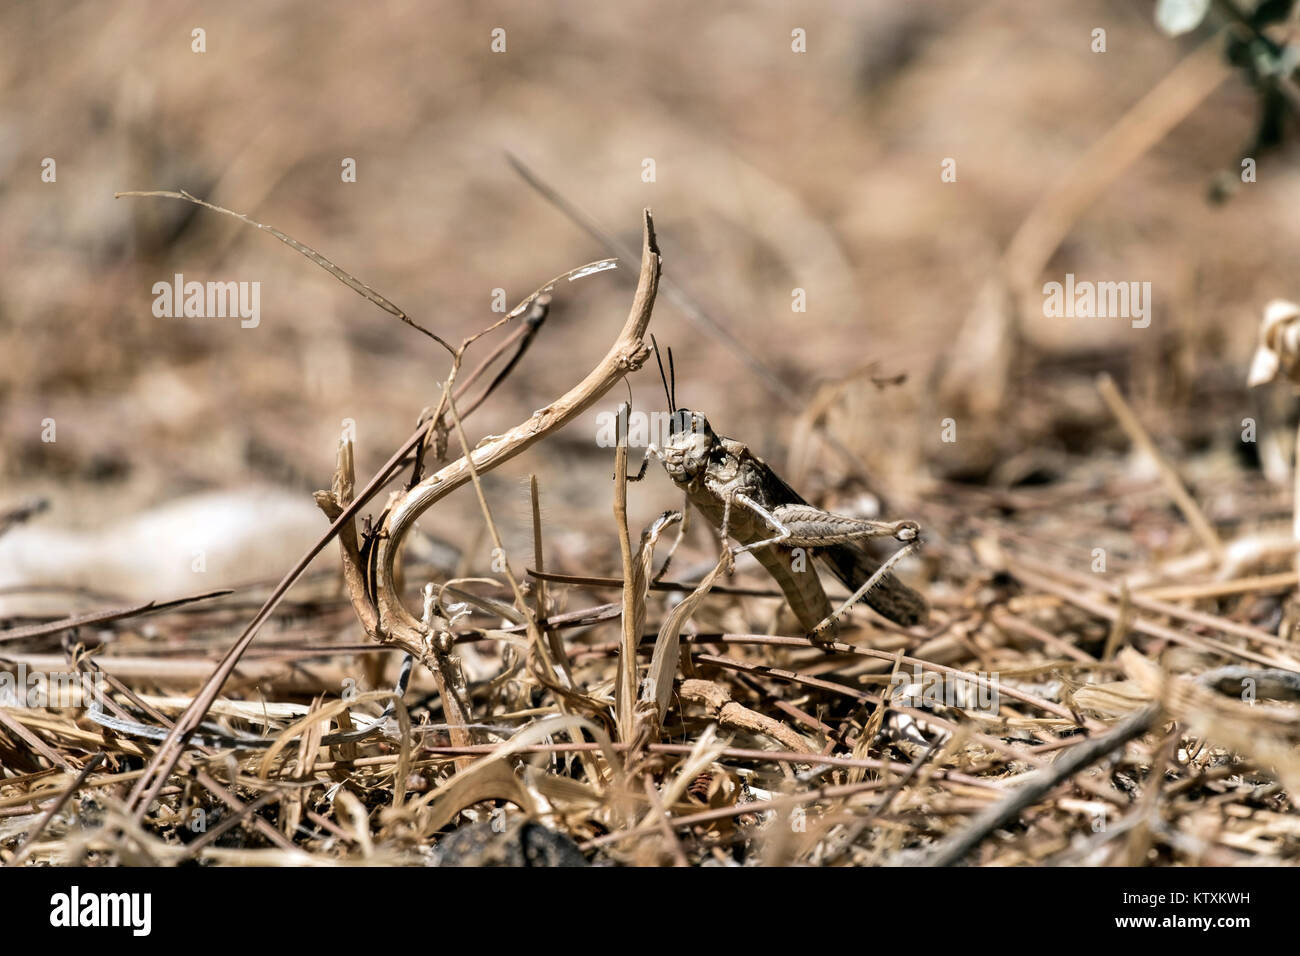 Desert locust versteckte sich in das trockene Gras (Sphingonotus octofasciatus) Stockbild